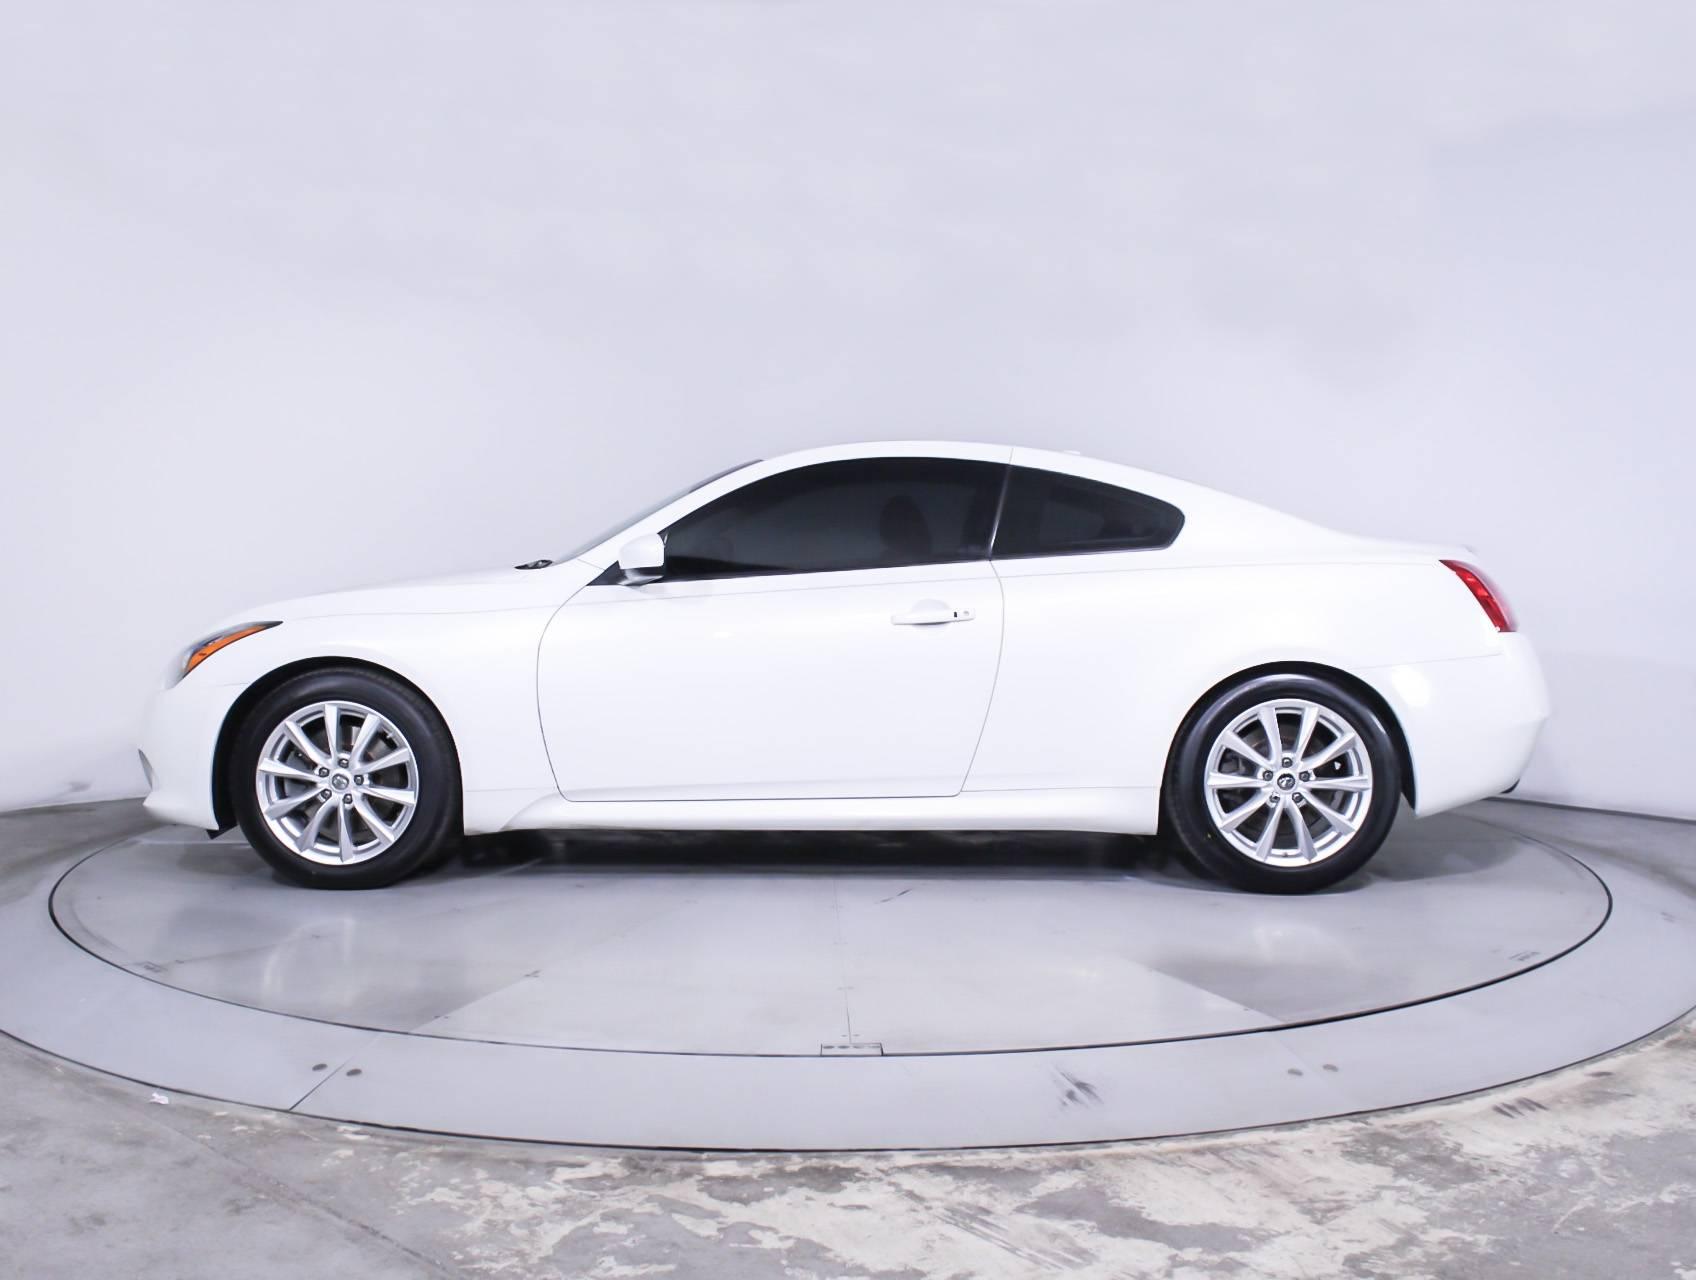 Used 2011 INFINITI G37 Coupe for sale in MIAMI, FL | 88111 | Florida Fine Cars